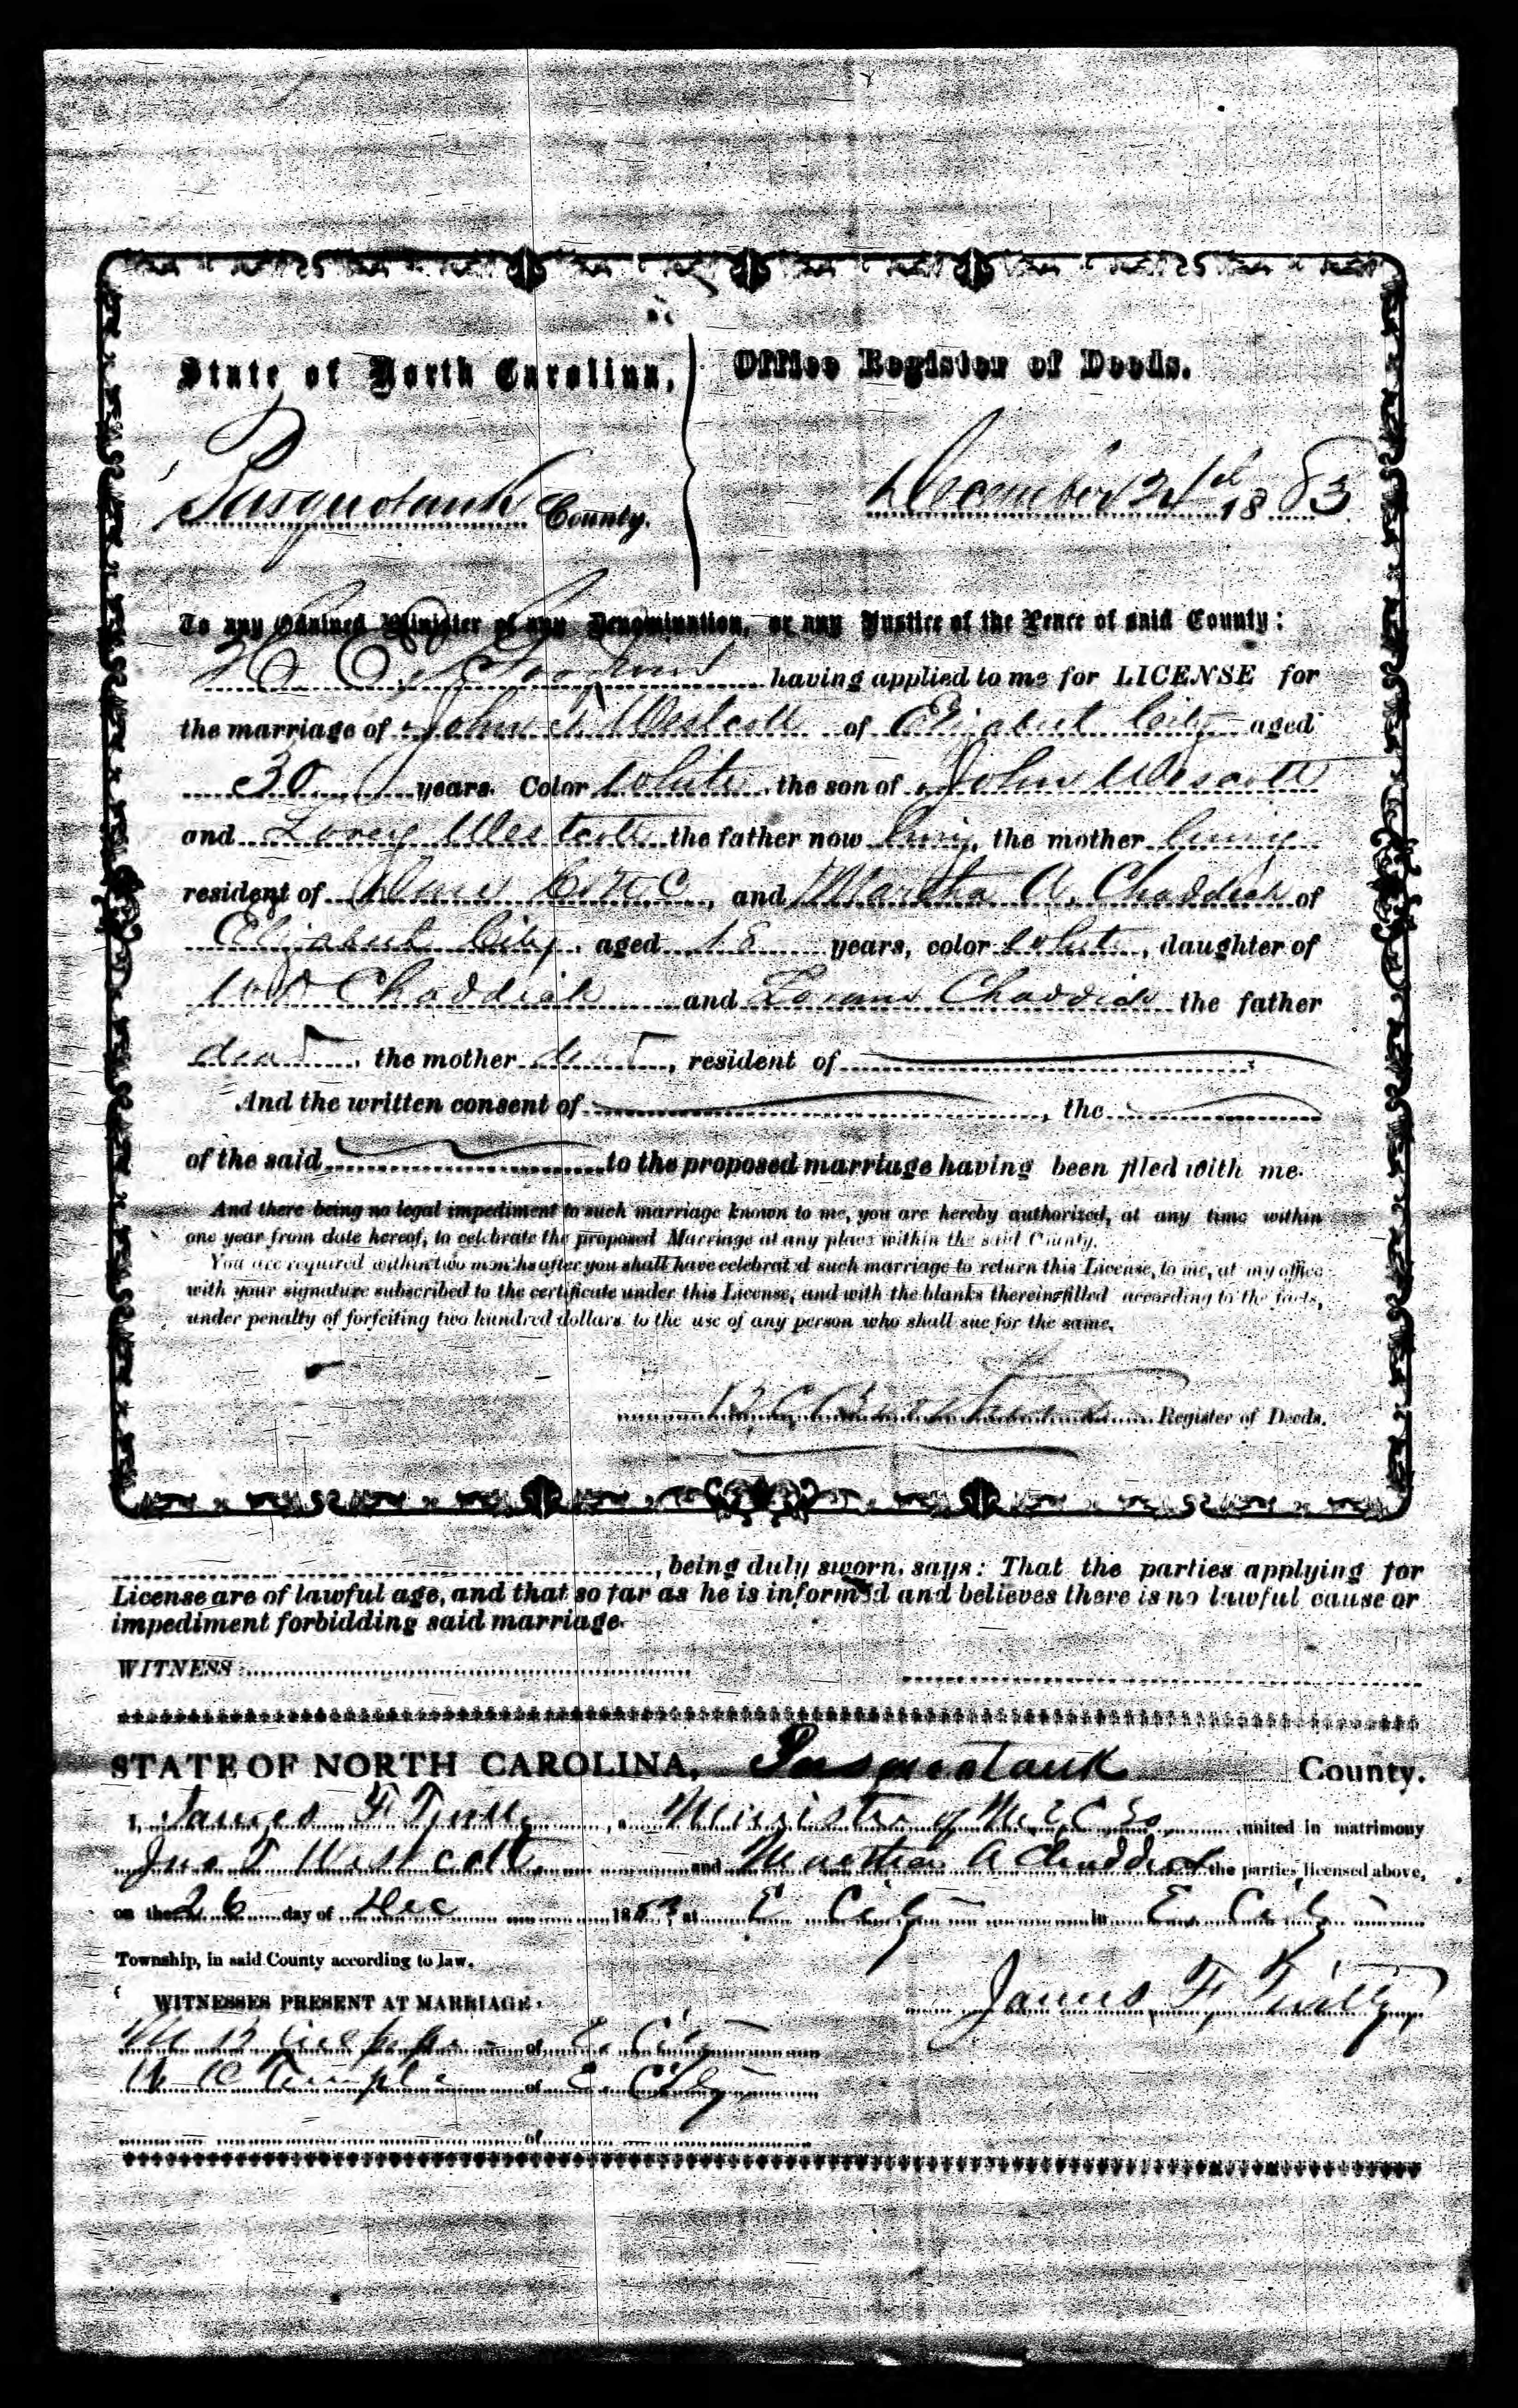 John T. Wescott and Martha Chadwick Marriage